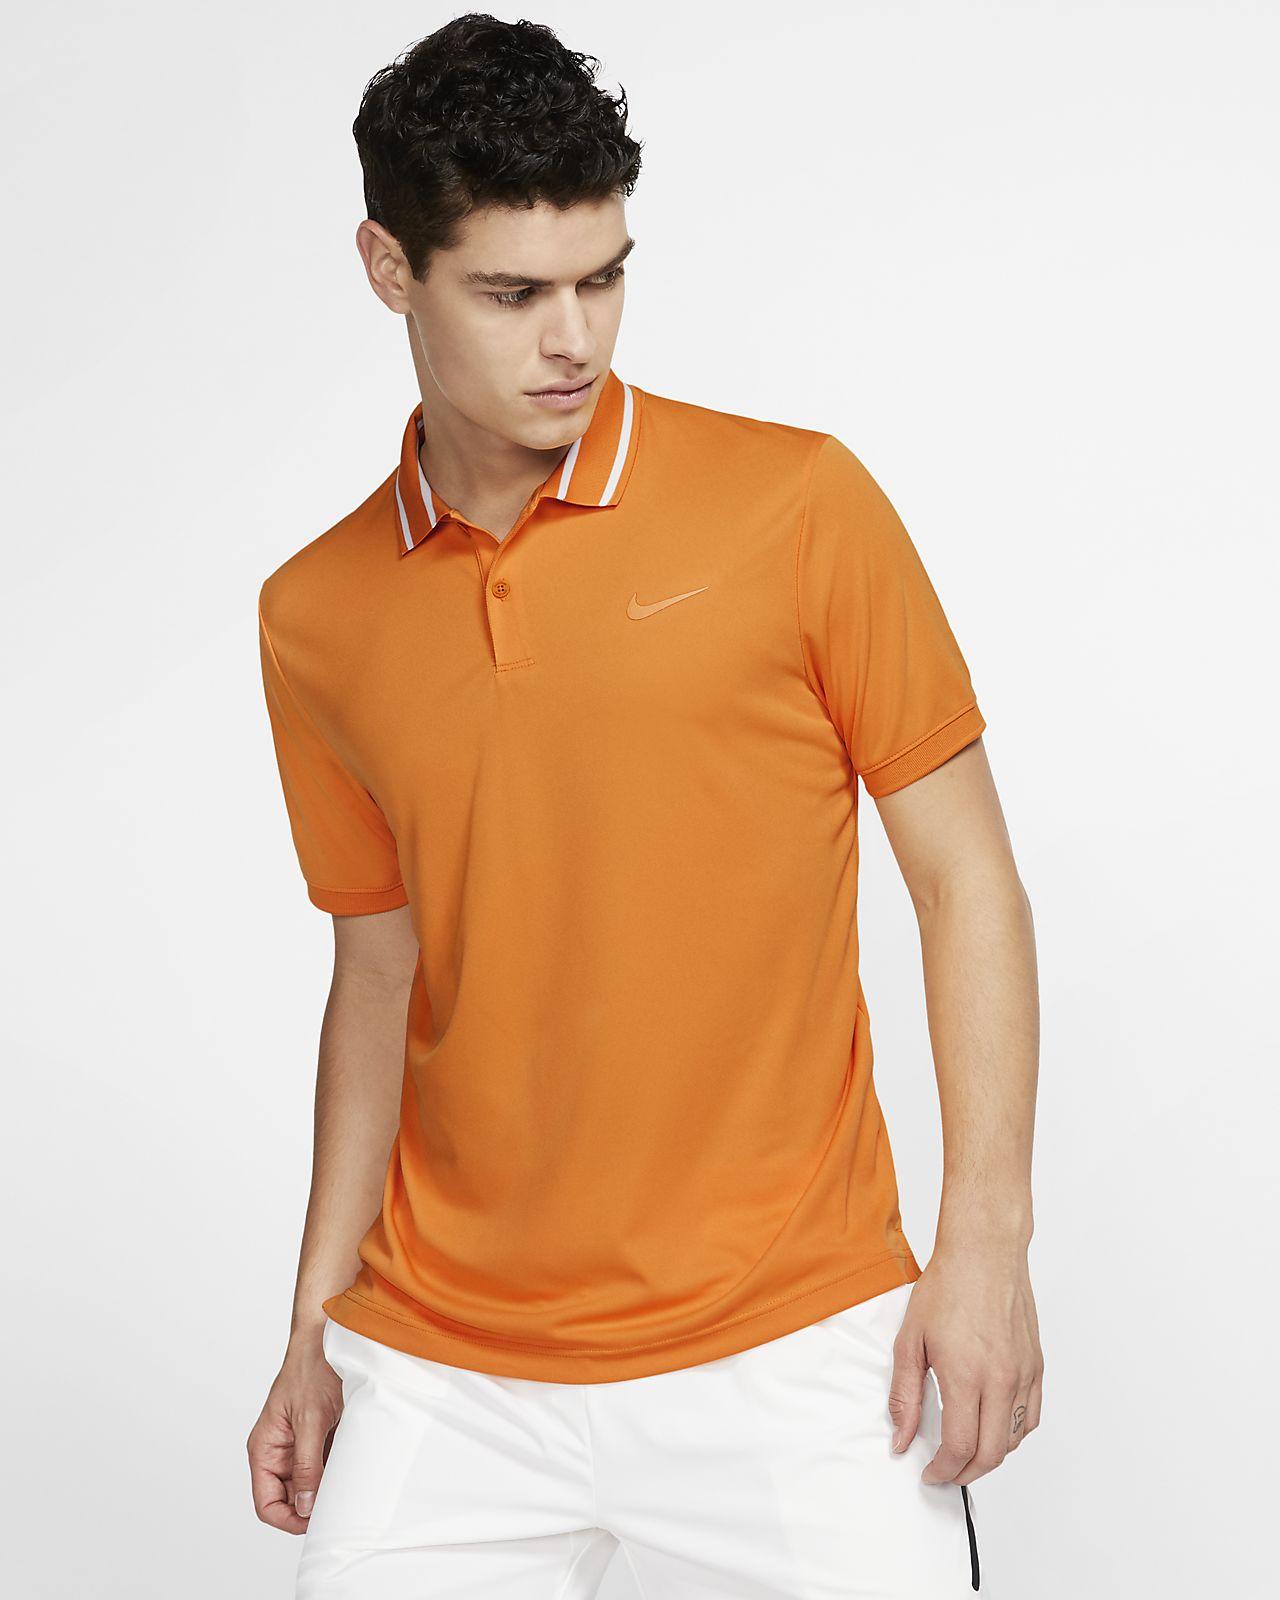 6d79e7169764ed NikeCourt Dri-FIT Tennis-Poloshirt für Herren. Nike.com BE